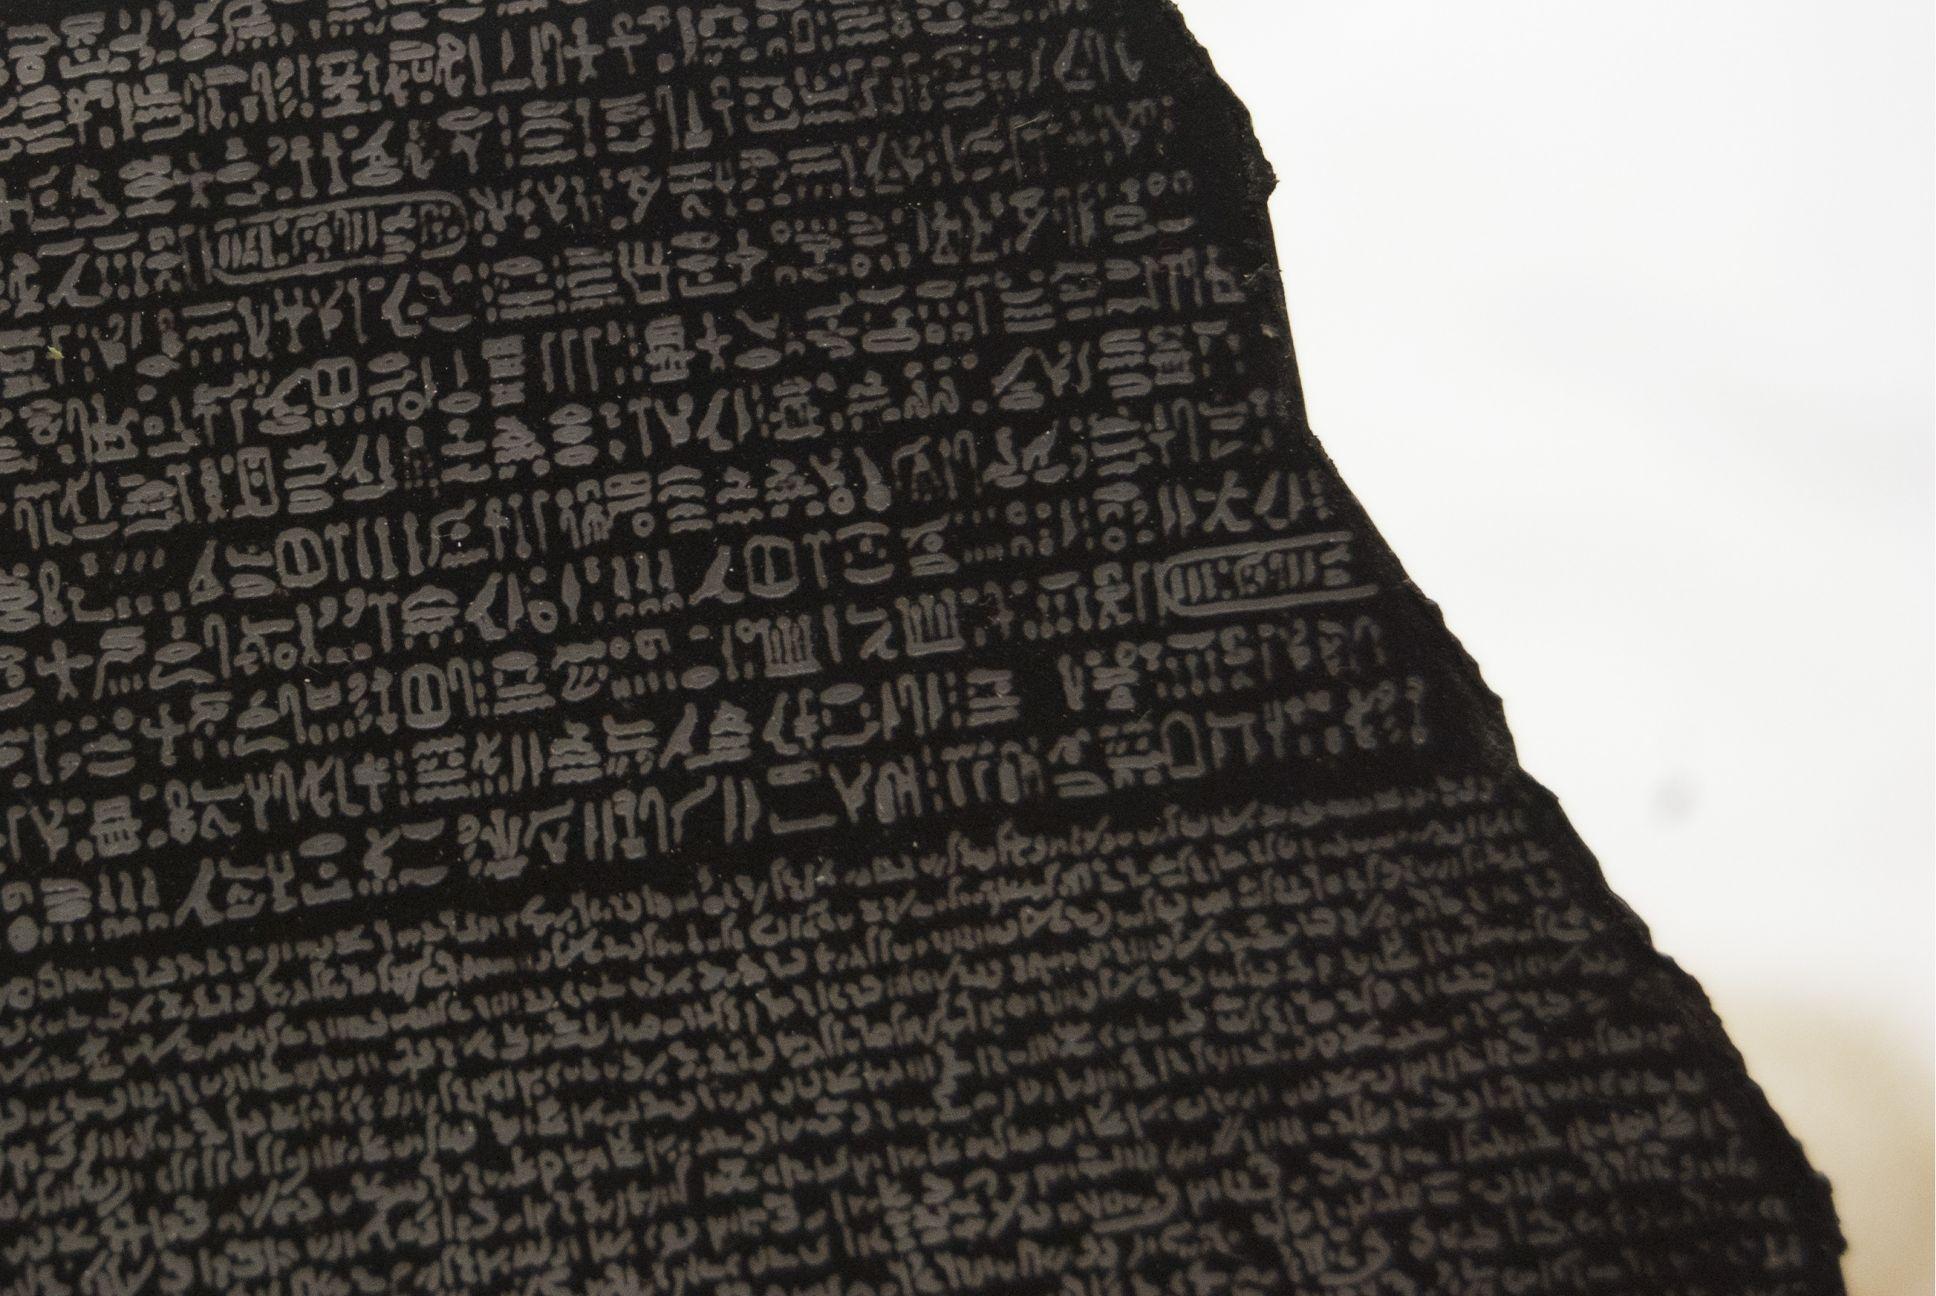 Réplica piedra de Rossetta. Rossetta stone replica